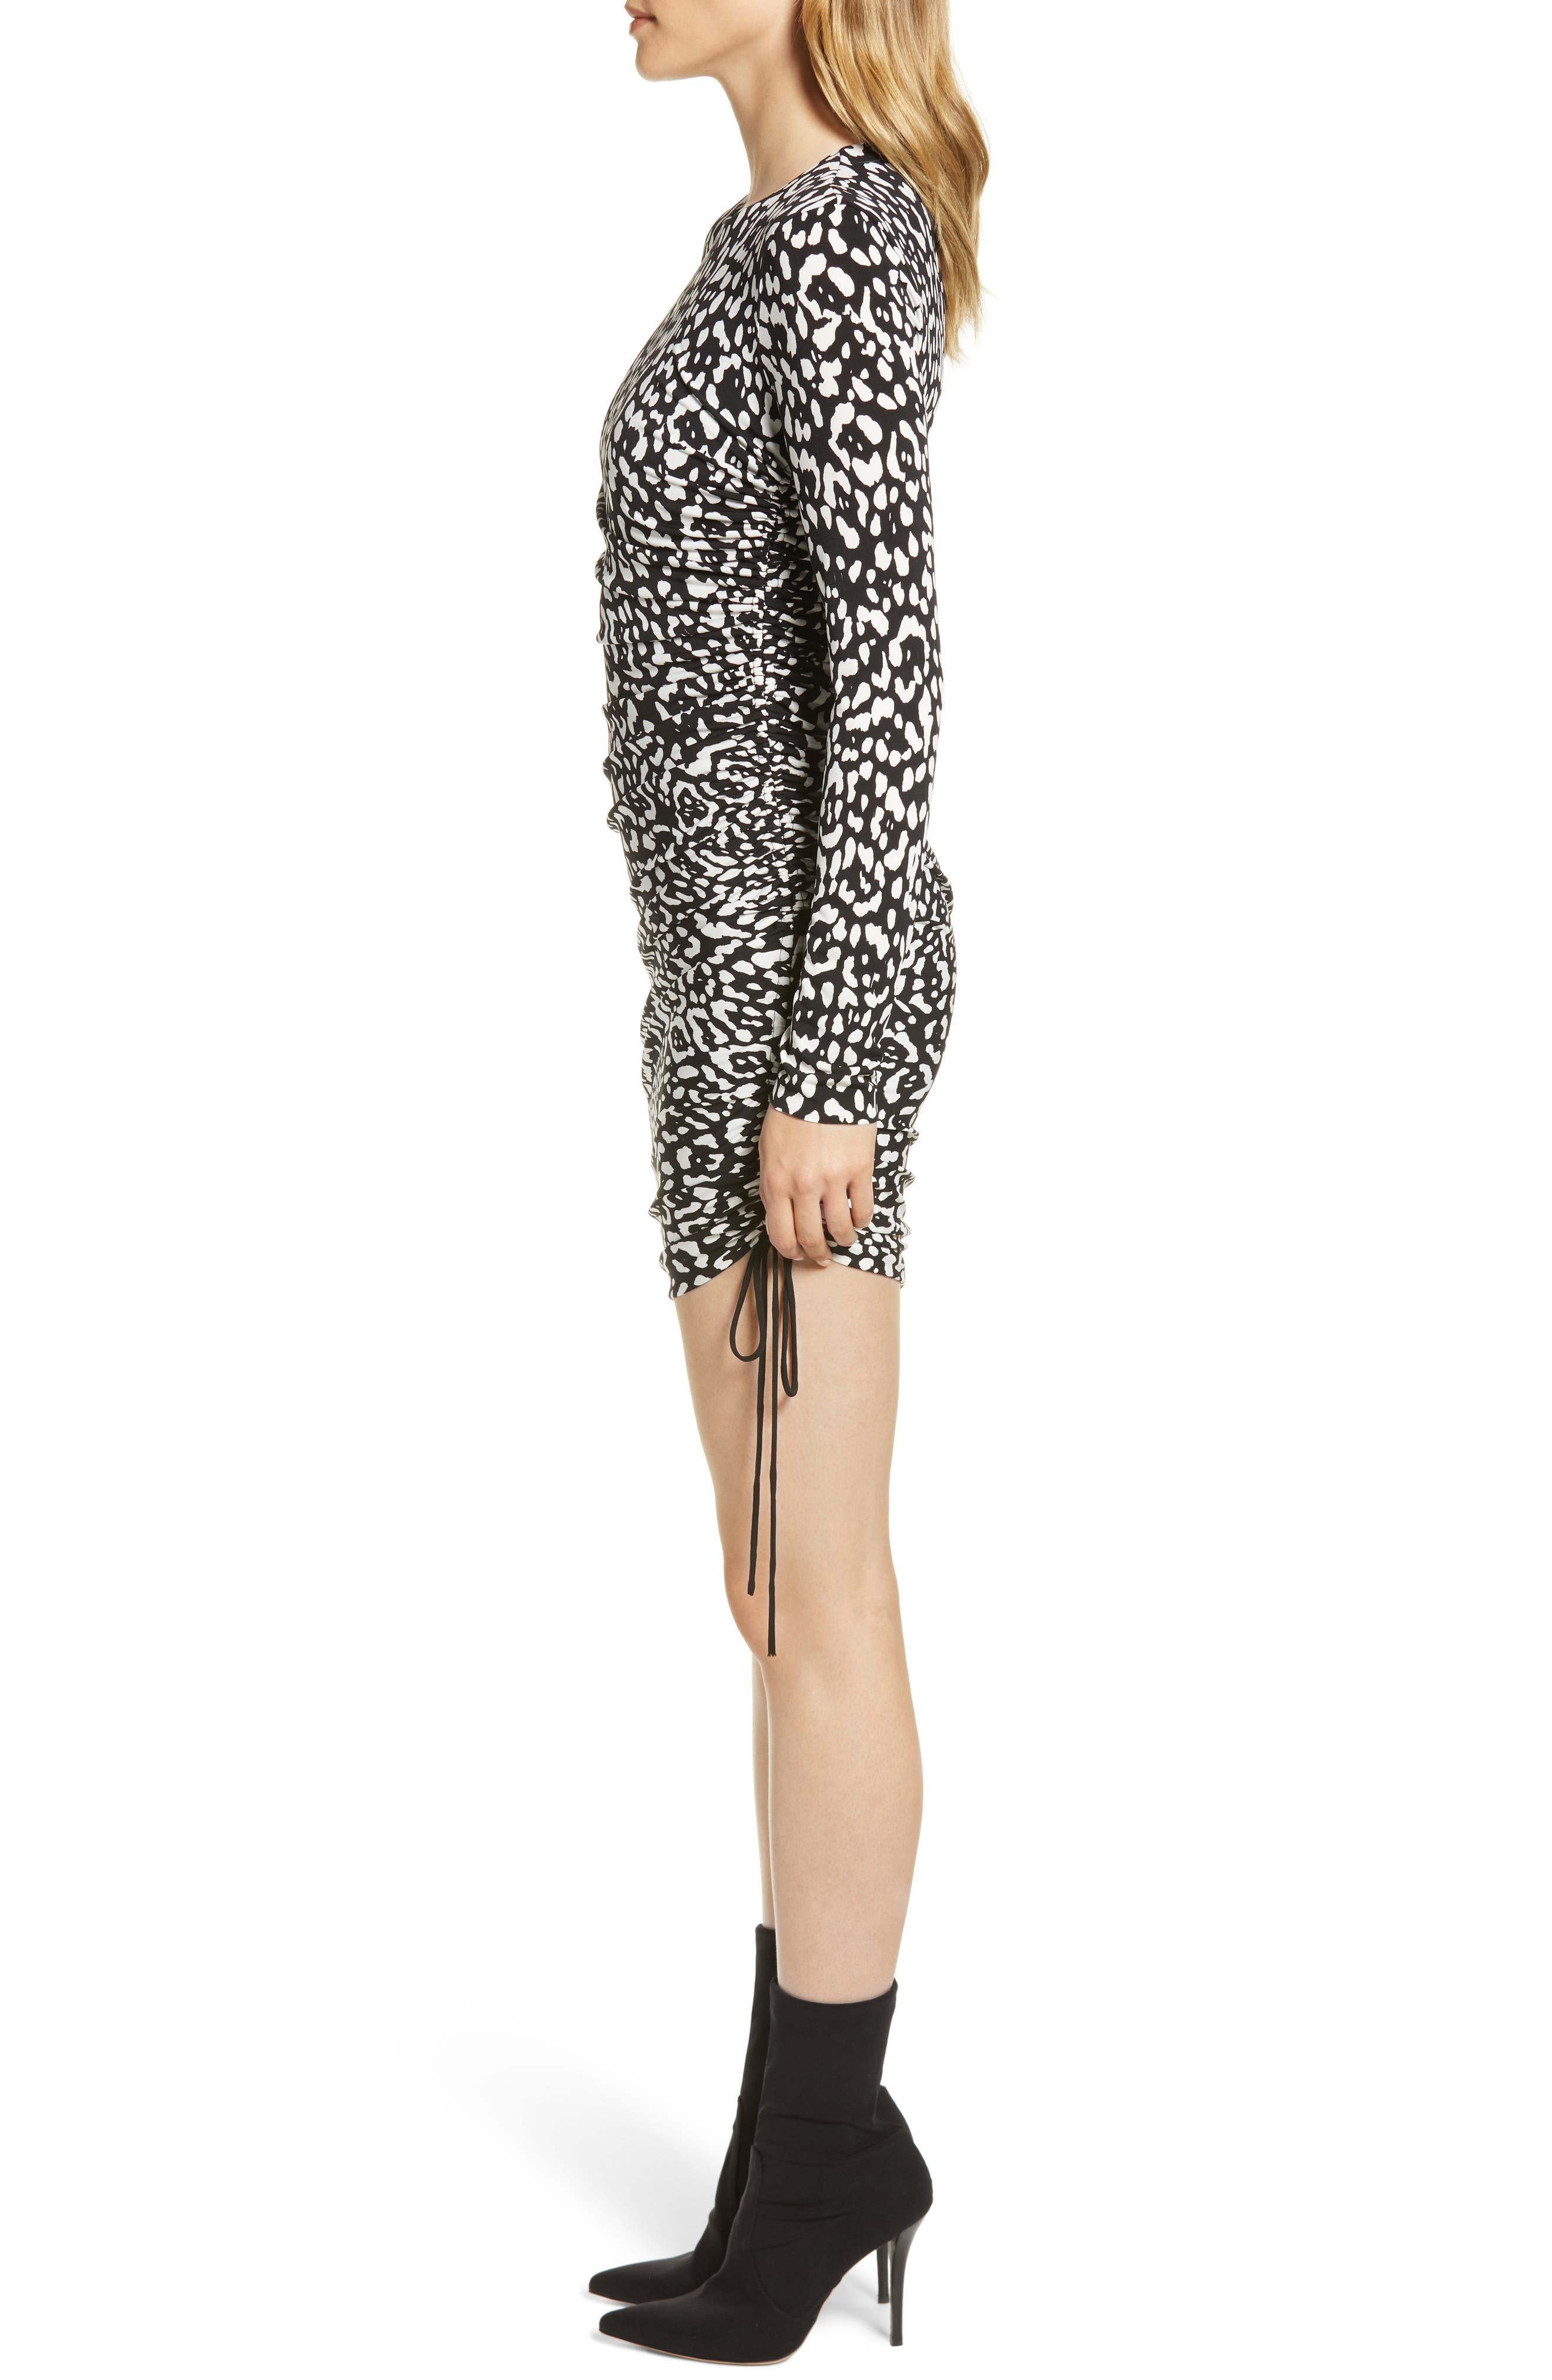 Boogie Wonderland Leopard Print Minidress,                             Alternate thumbnail 3, color,                             BLACK/ CHALK